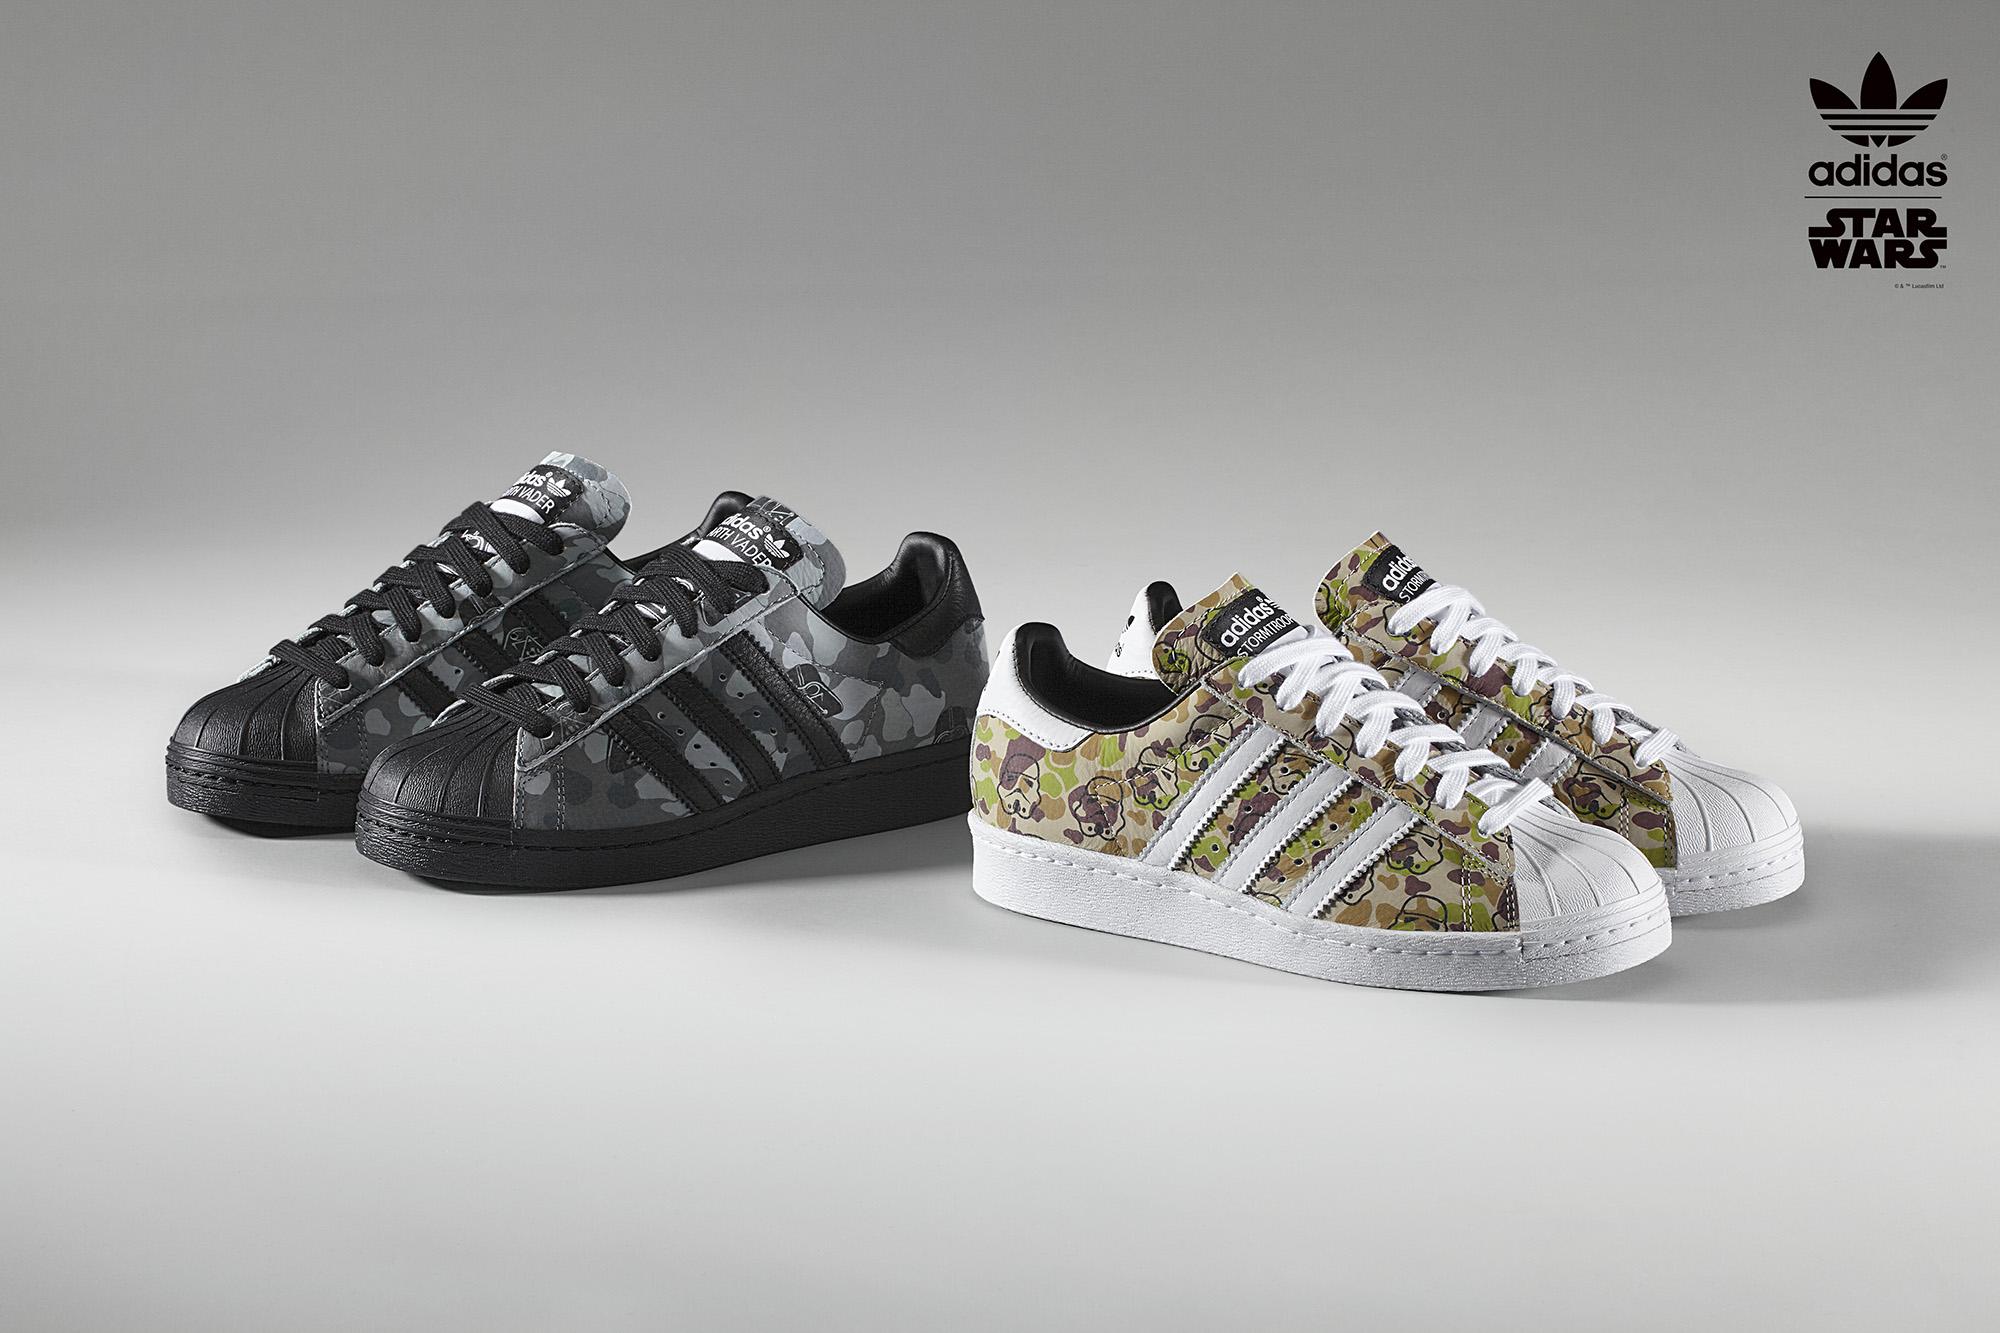 The adidas Originals Superstar 80s Receives